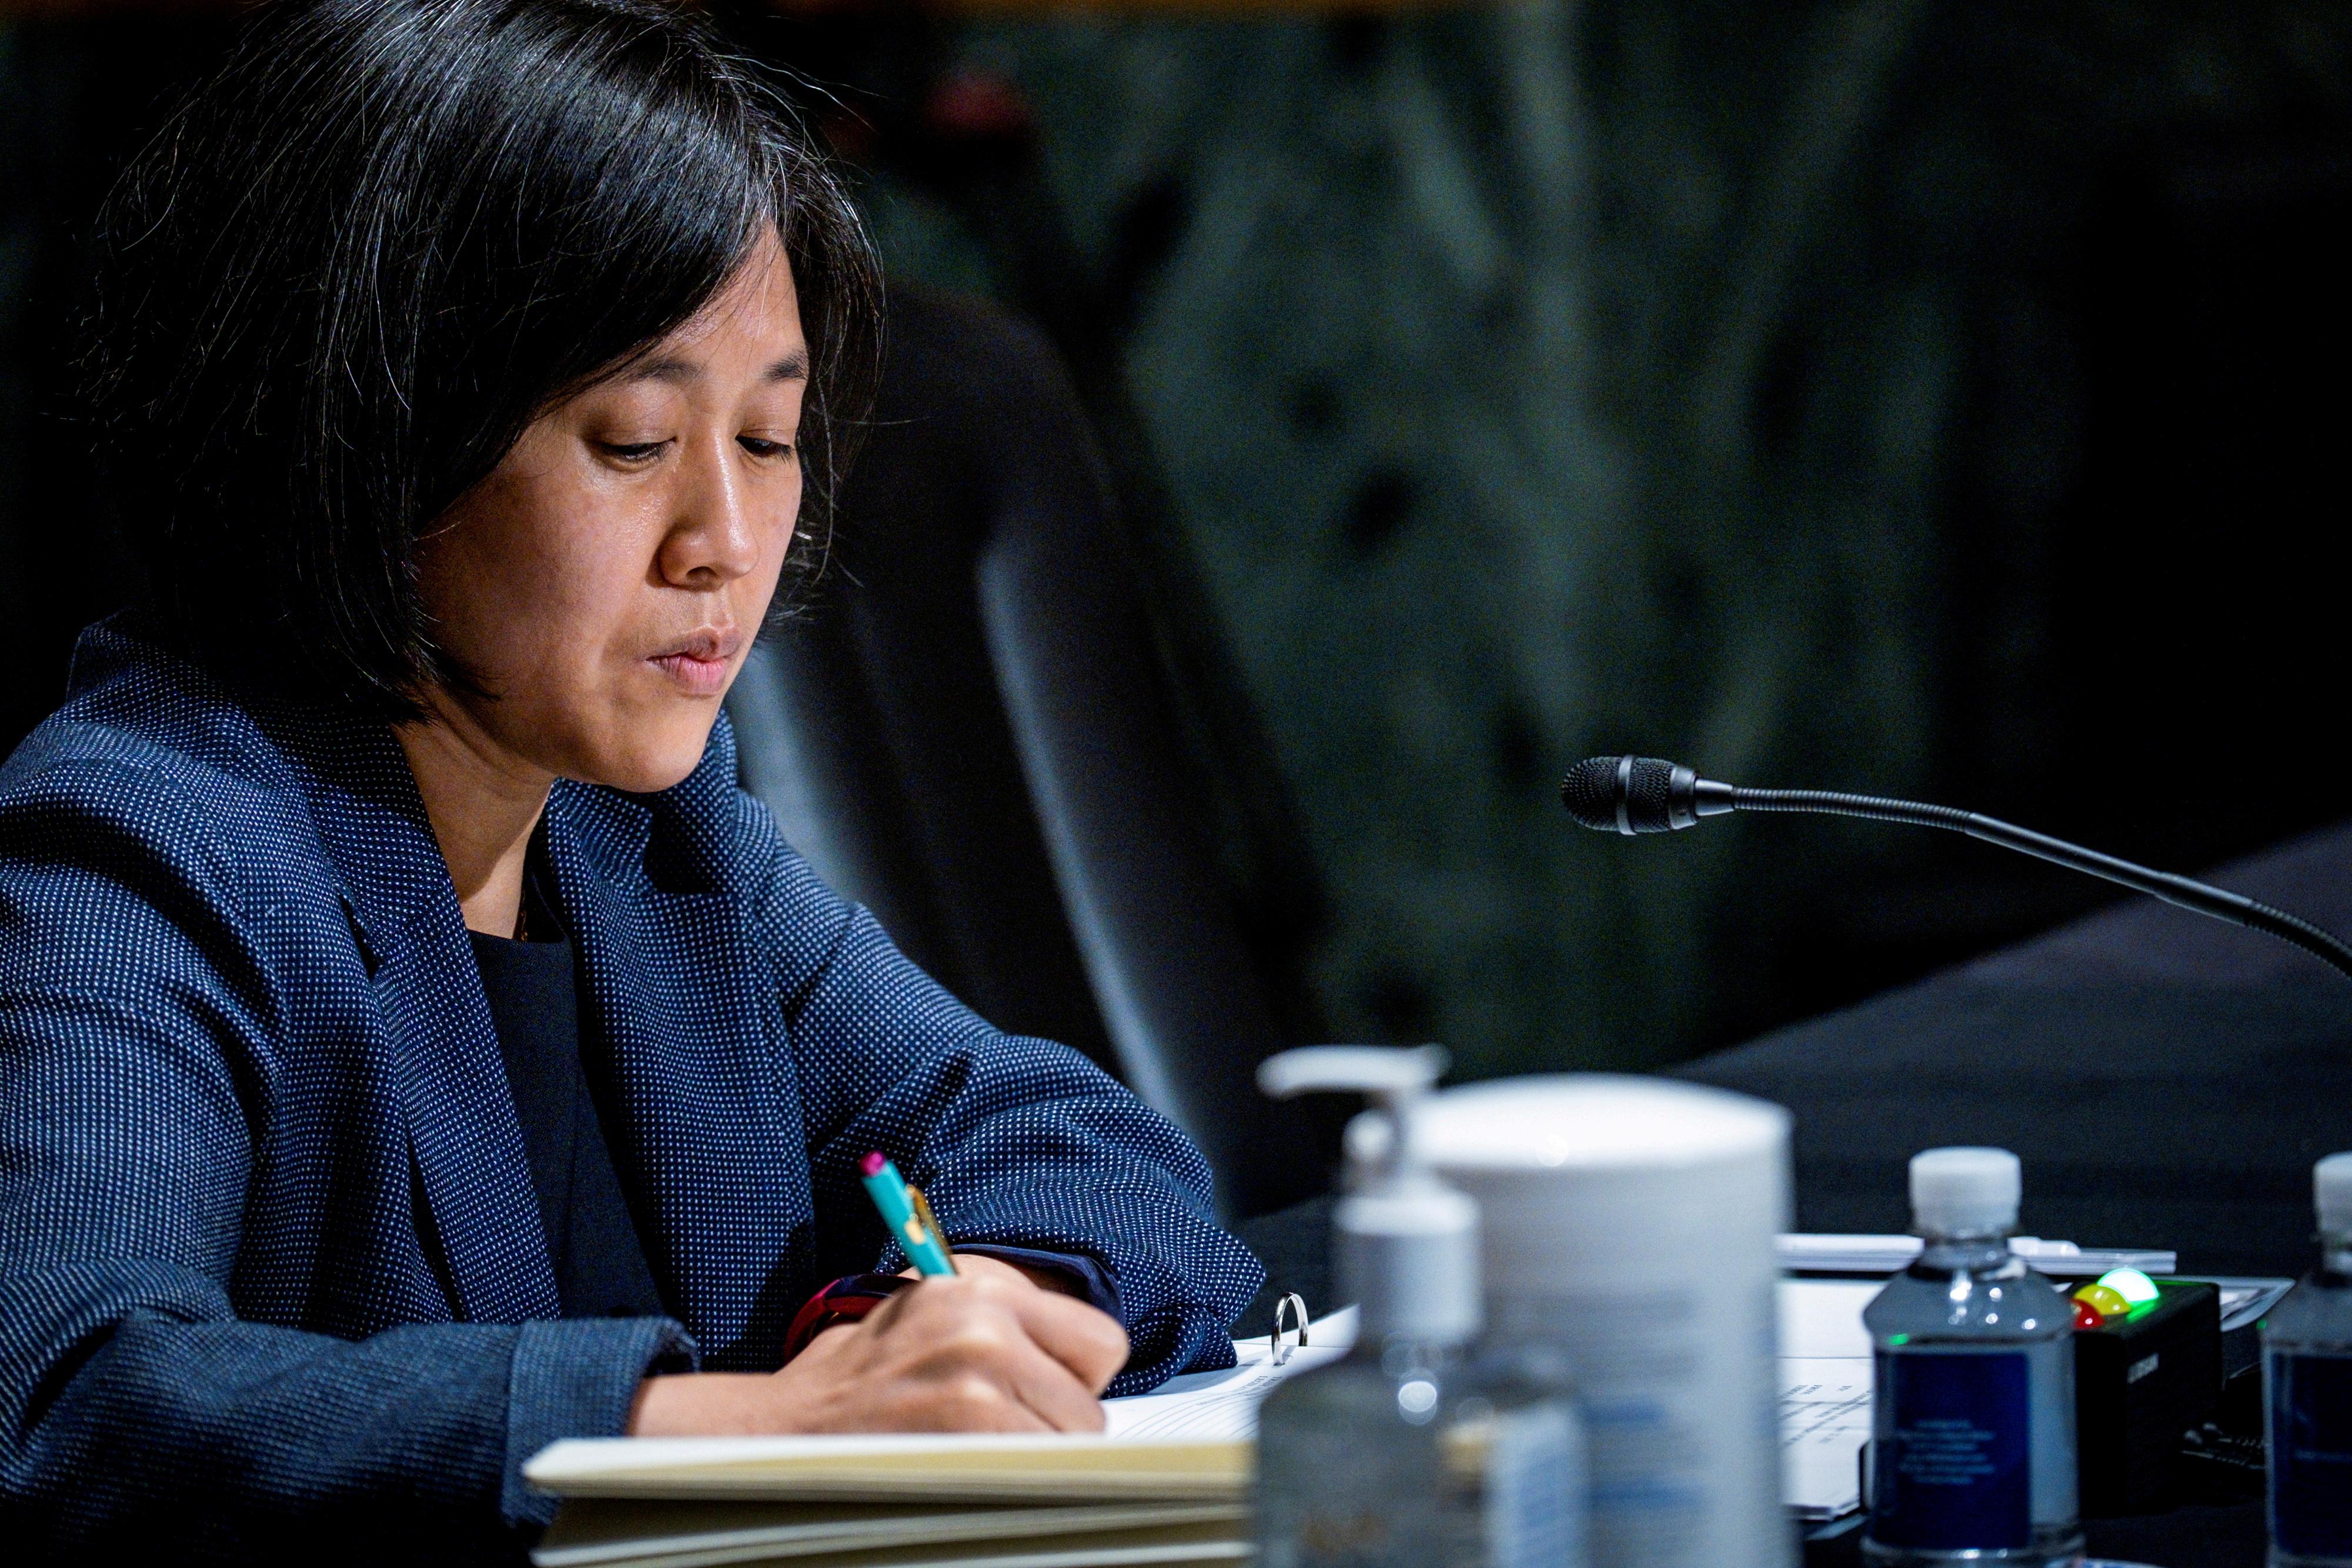 U.S. Trade Representative Katherine Tai testifies before the Senate Finance Committee on Capitol Hill in Washington, U.S., May 12, 2021. Pete Marovich/Pool via REUTERS